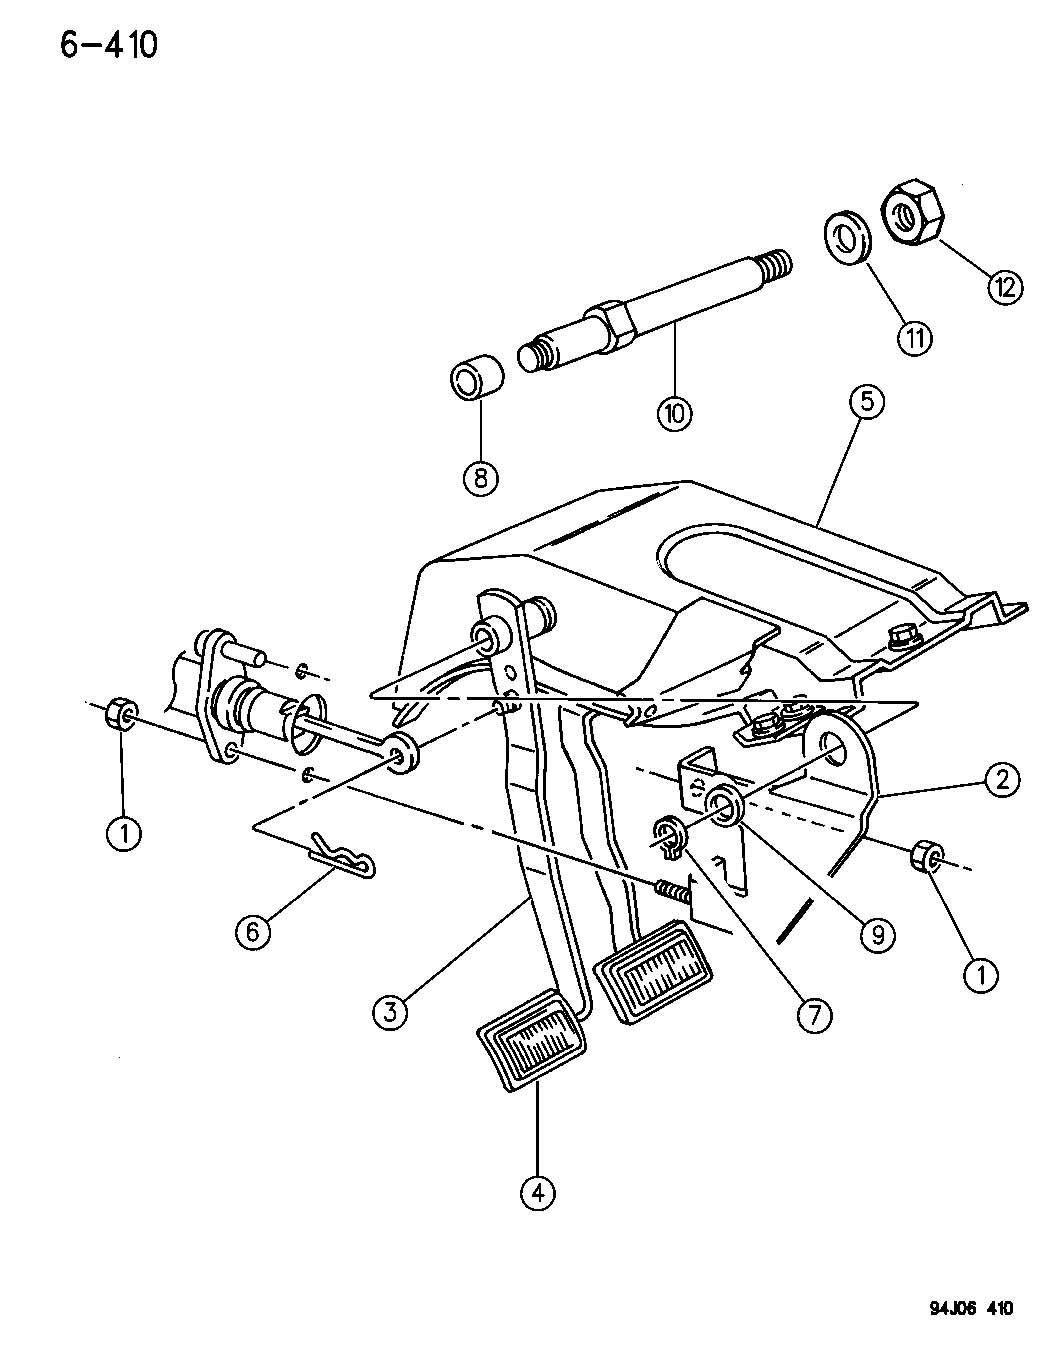 1995 Jeep Wrangler PEDAL, CLUTCH WRANGLER, YJ